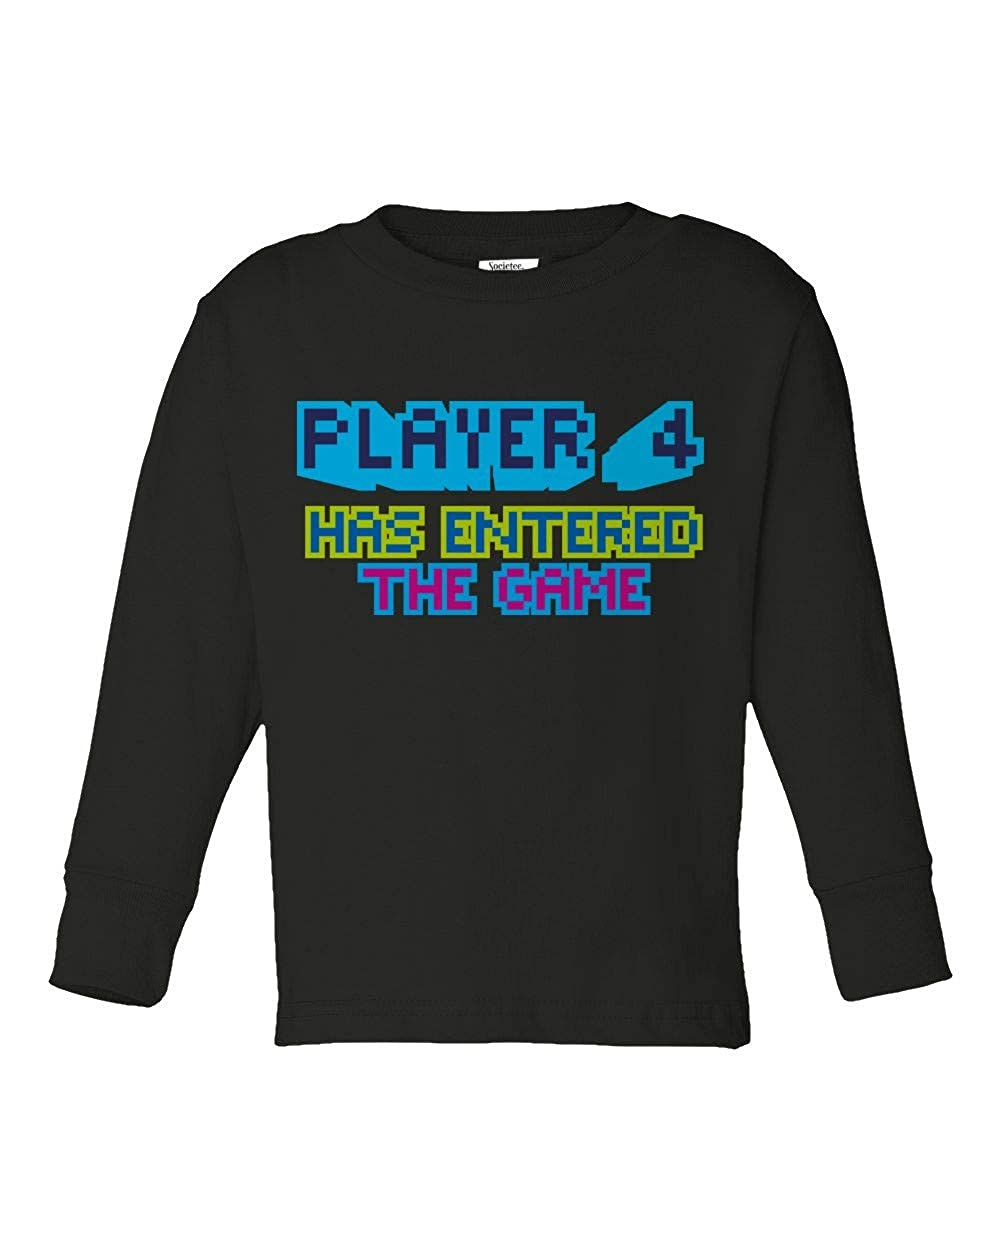 Societee Player 4 Has Entered The Game Girls Boys Toddler Long Sleeve T-Shirt